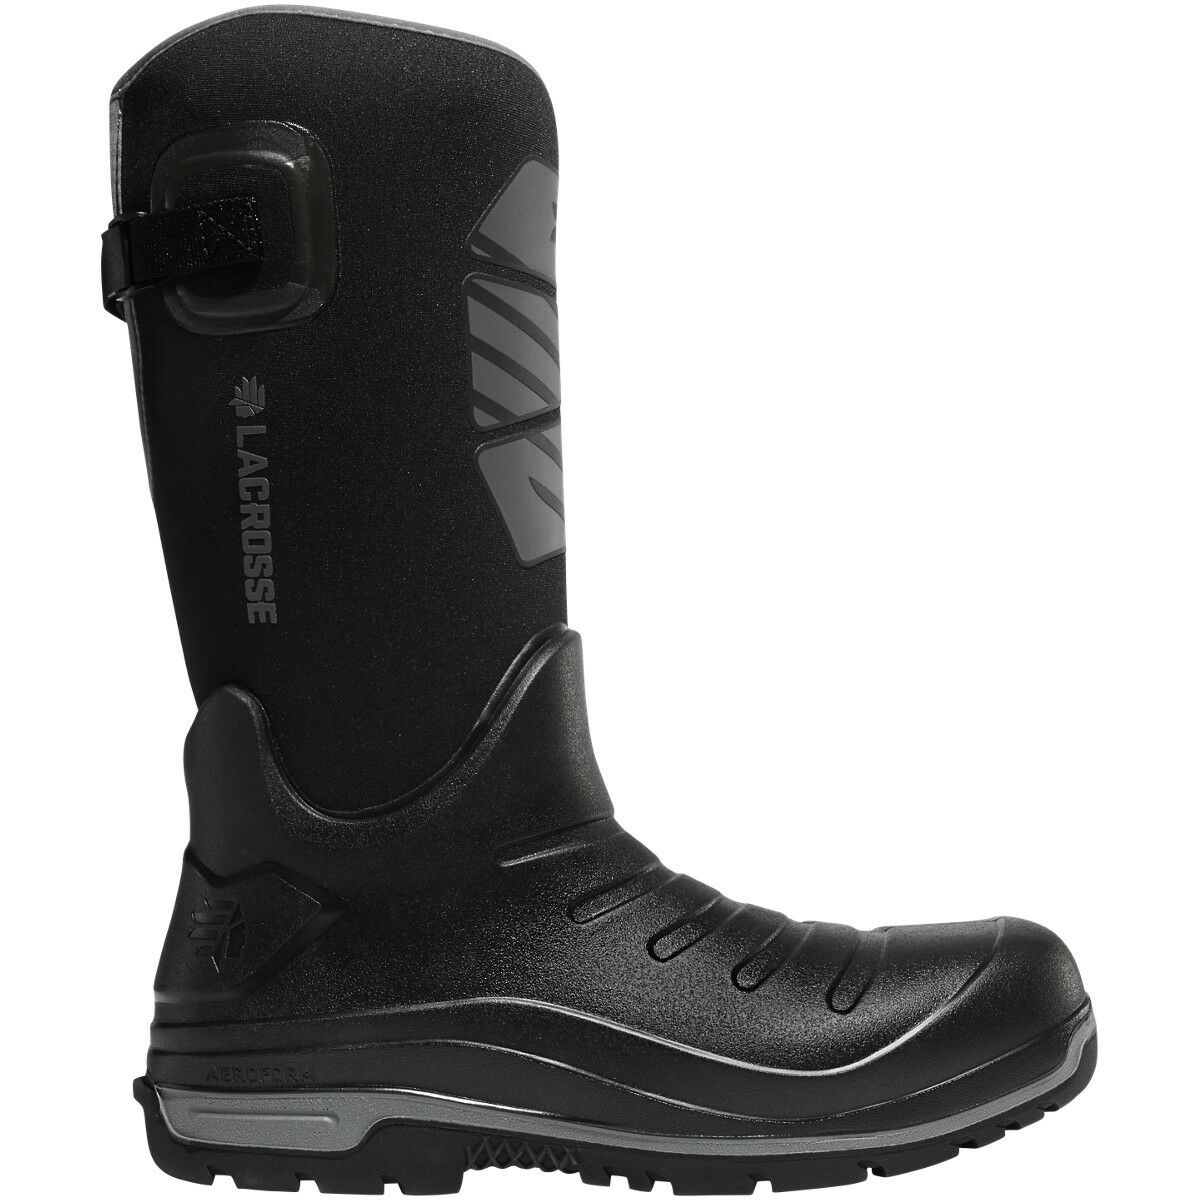 Lacrosse para hombres 664554 Aero Aislador 14  Negro grupo Telefónico Móvil Nórdico Invierno Nieve Calzado botas